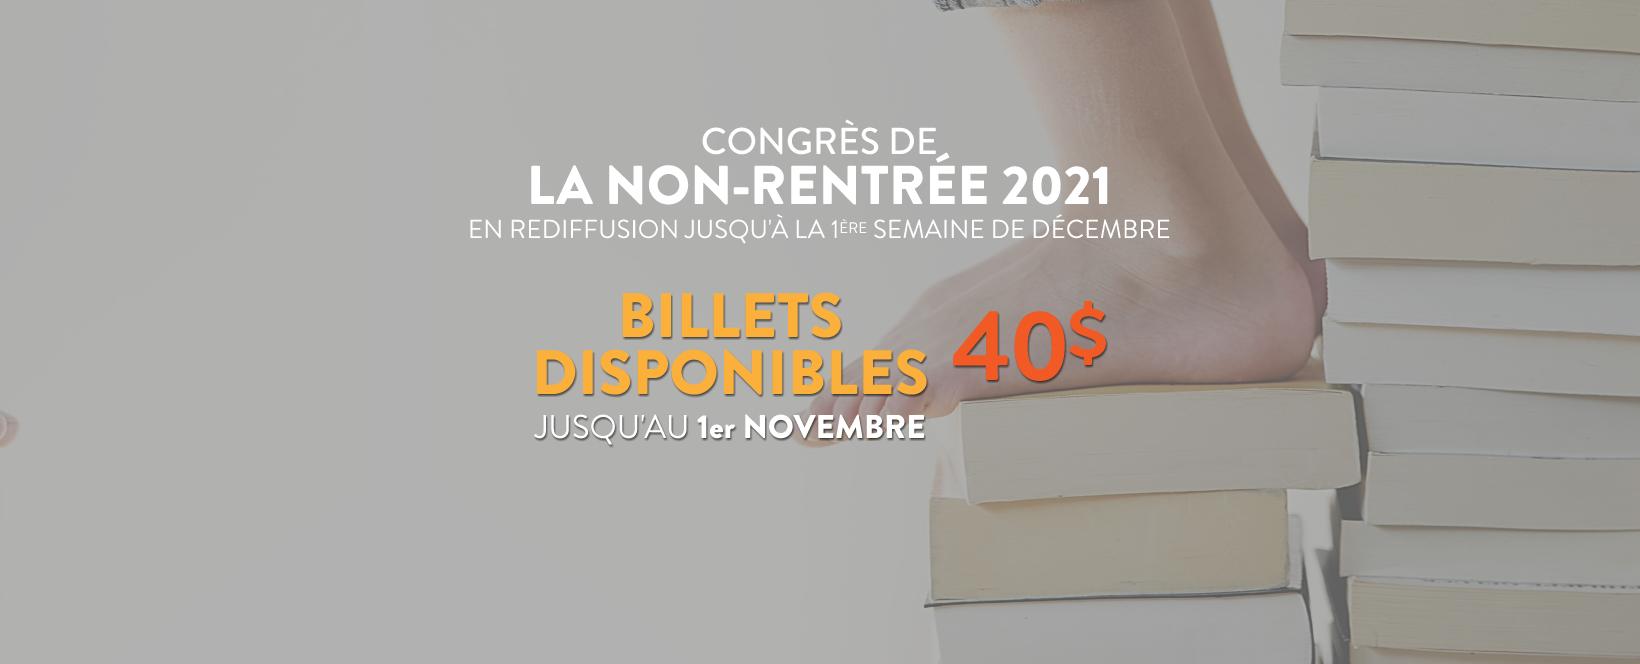 Congrès de la non-rentrée 2021